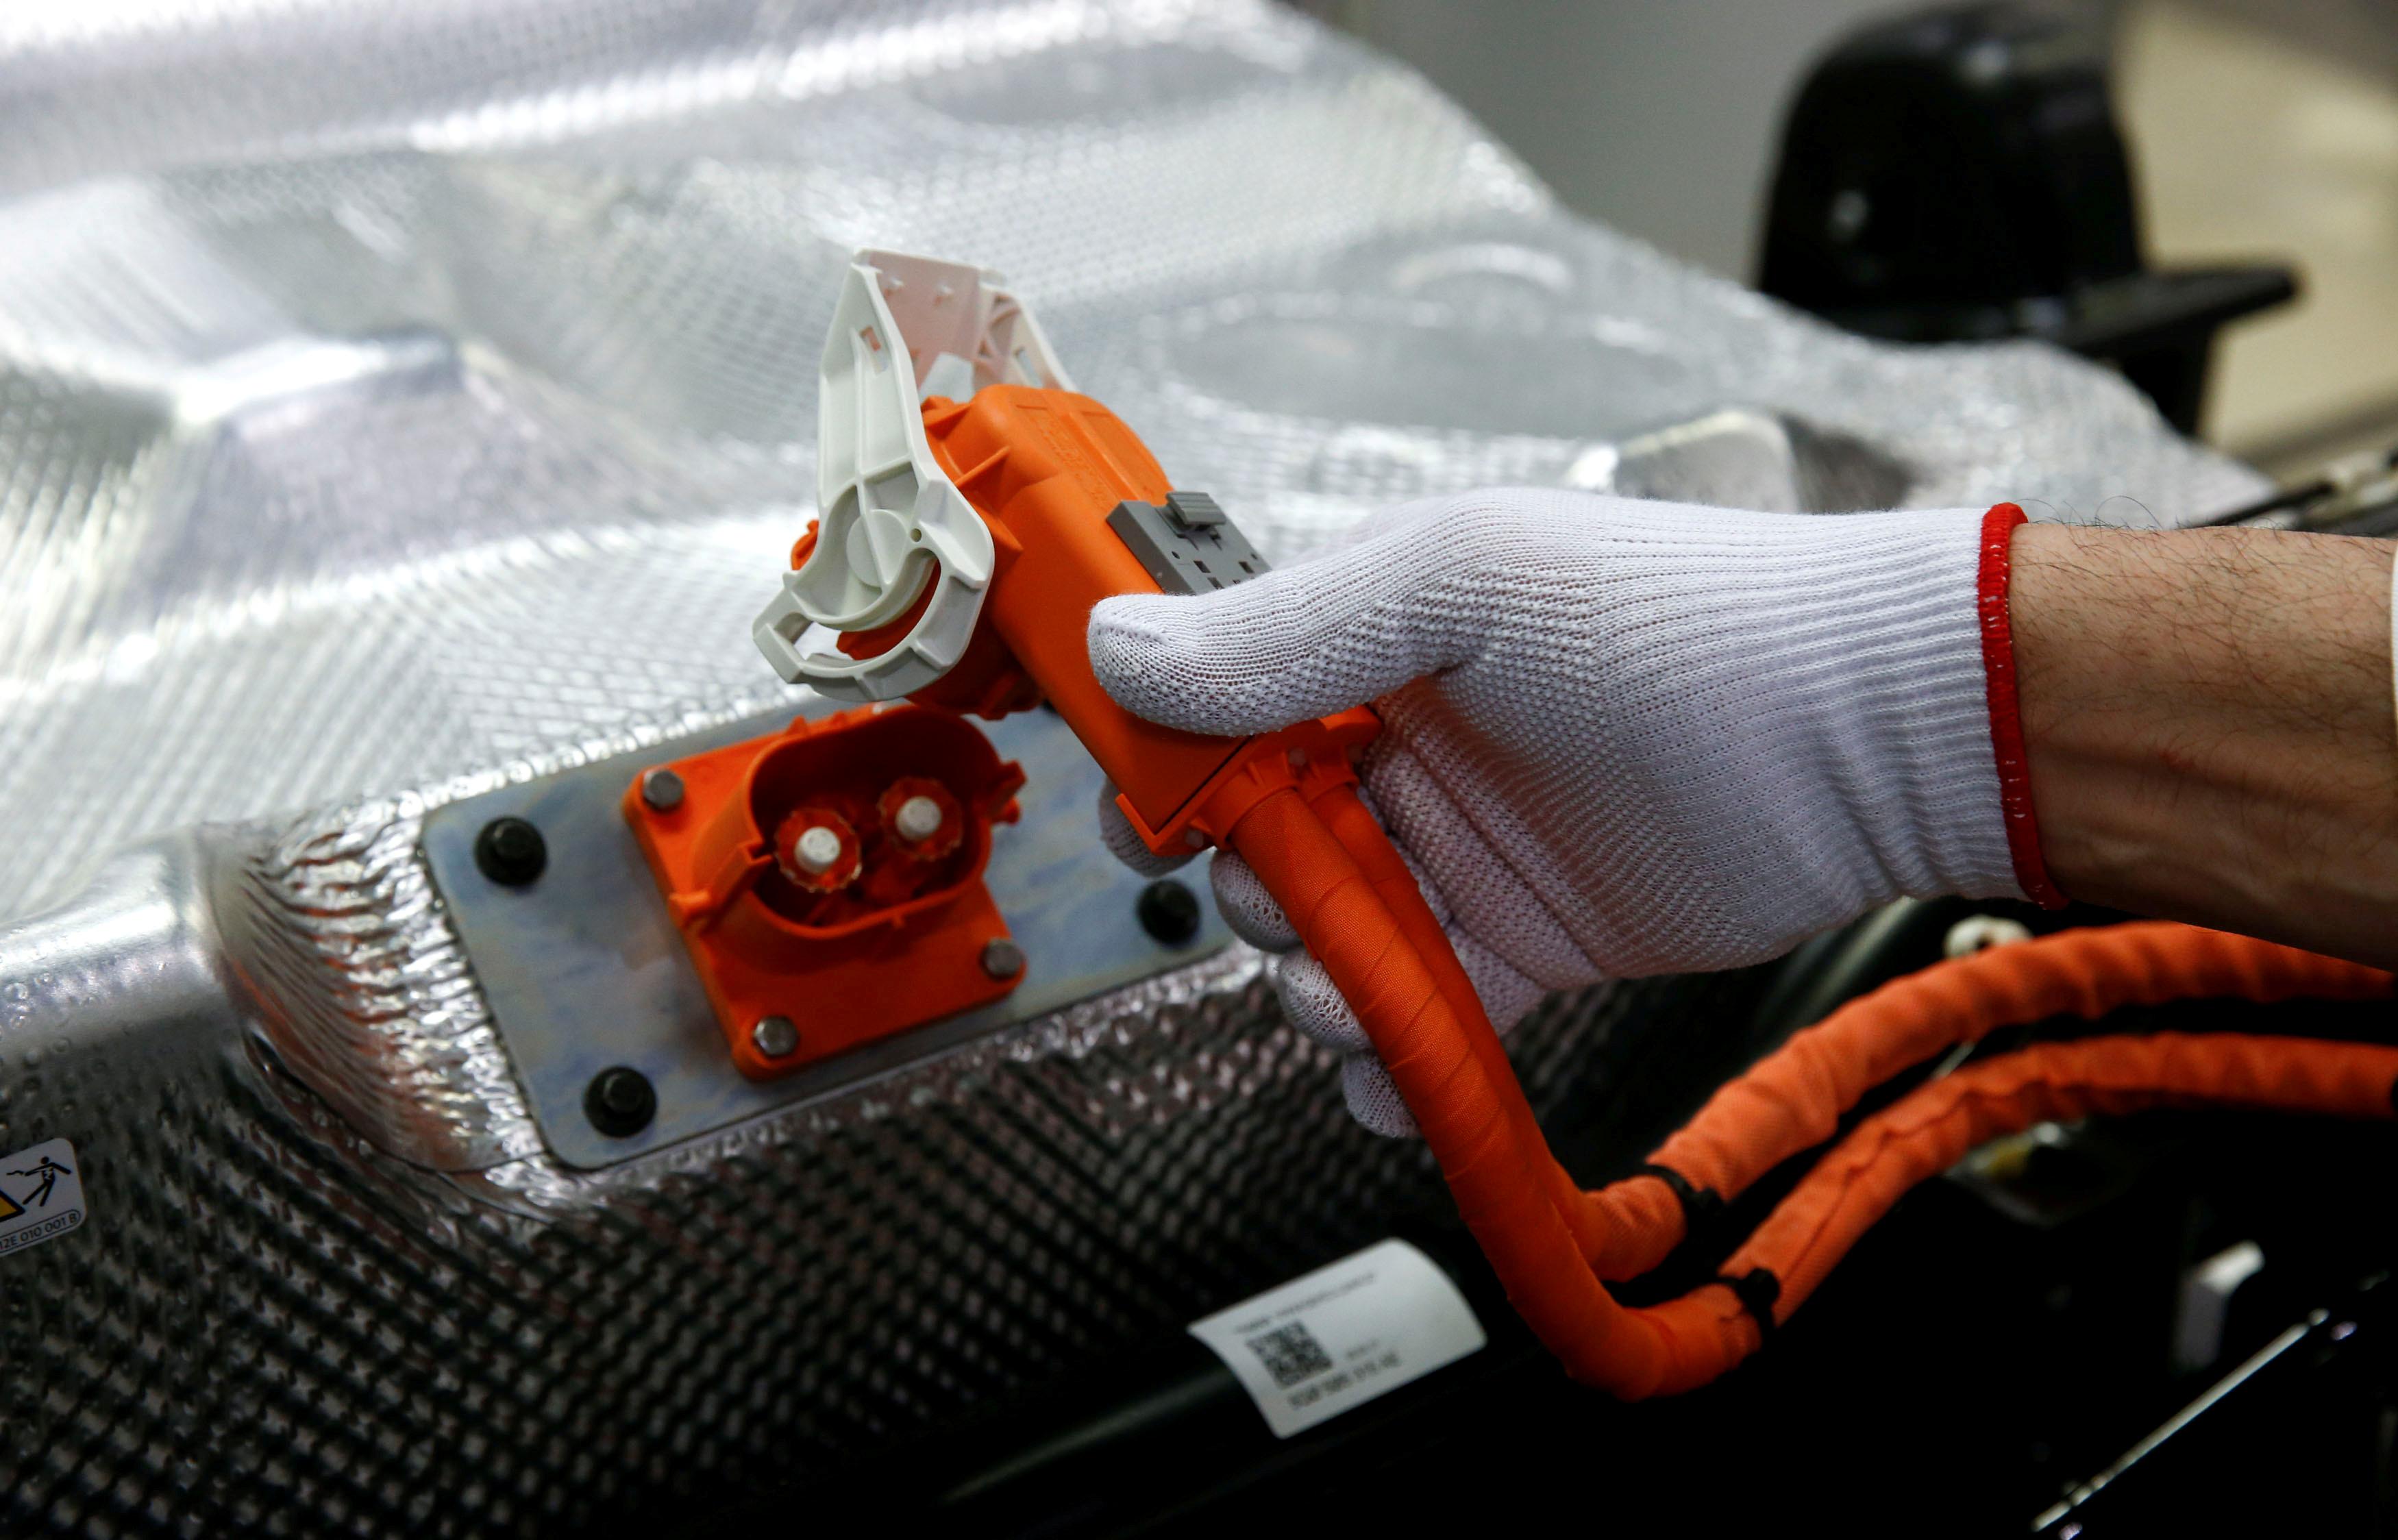 Volkswagen open to joining German battery cell consortium: source